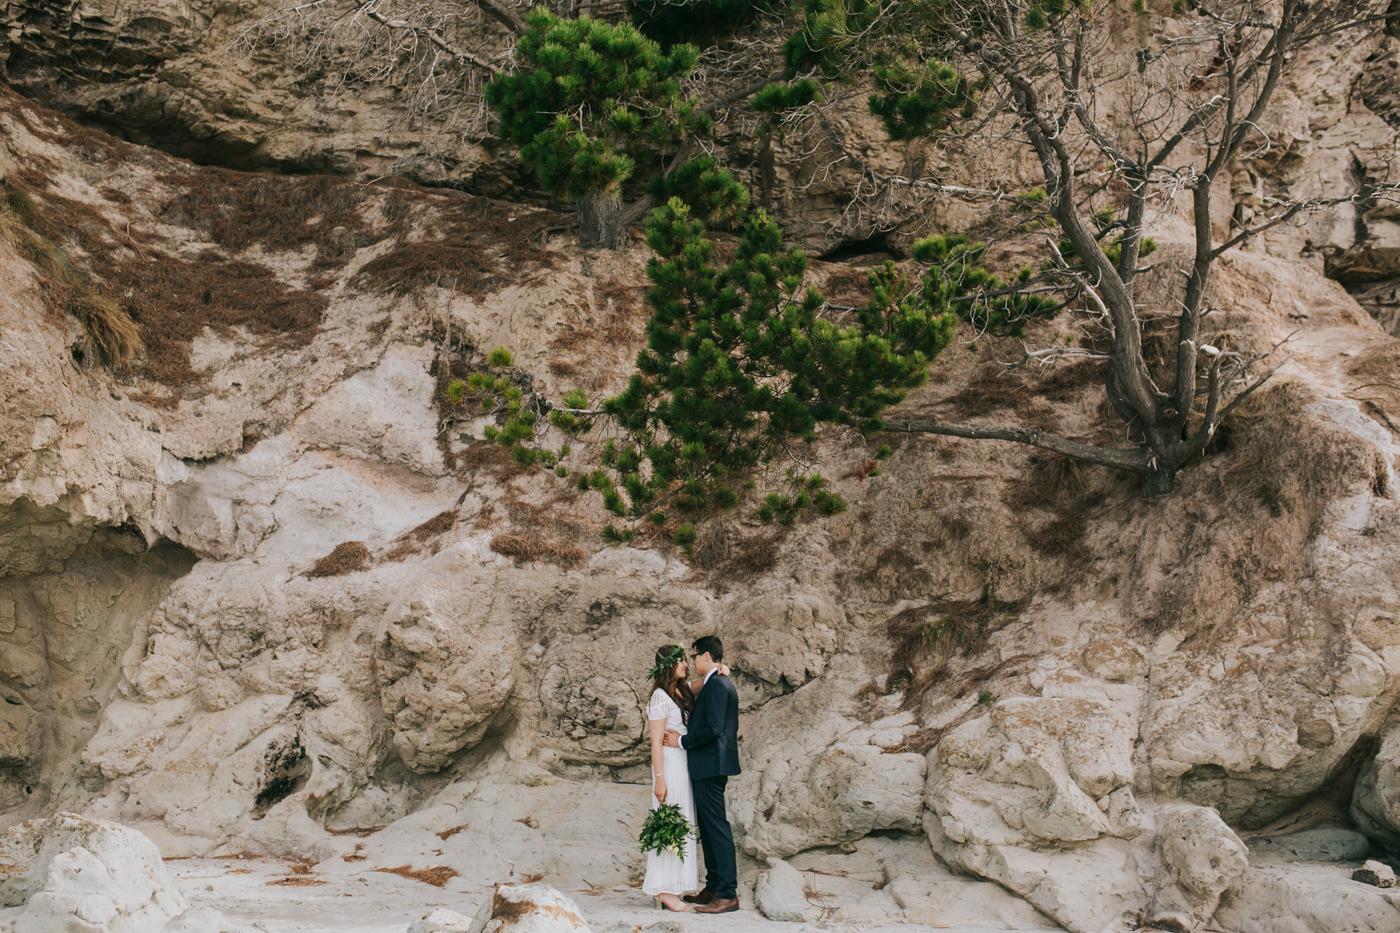 Ariana & Tim - Dunedin, New Zealand Wedding - Destination Wedding - Samantha Heather Photography-147.jpg